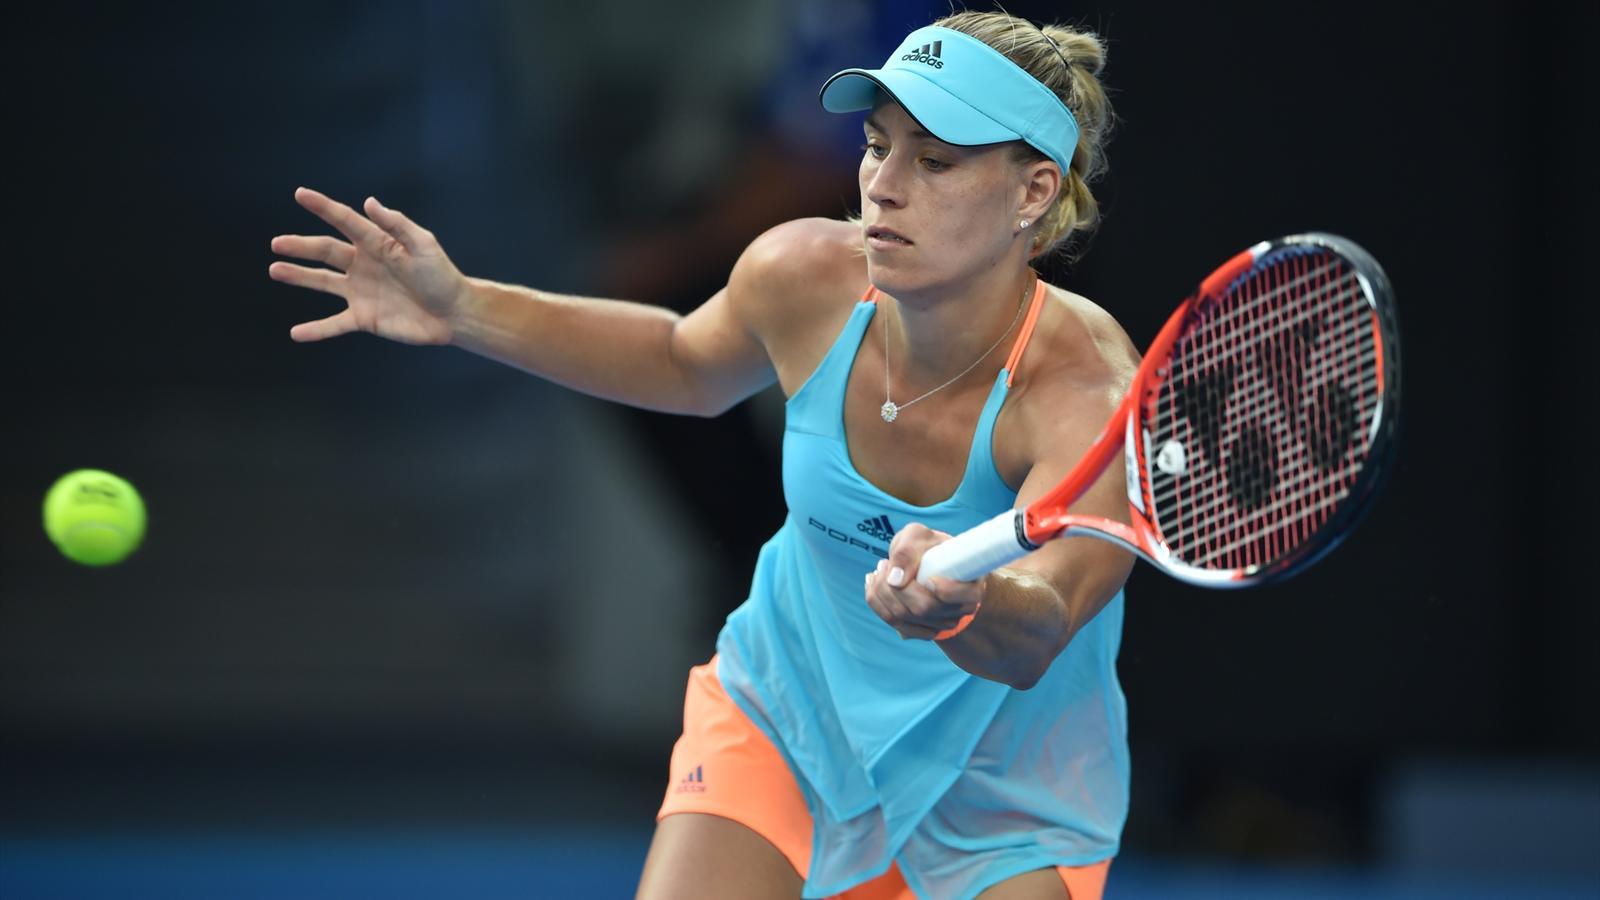 Defending champion Angelique Kerber survives scare to beat Lesia Tsurenko - Australian Open ...